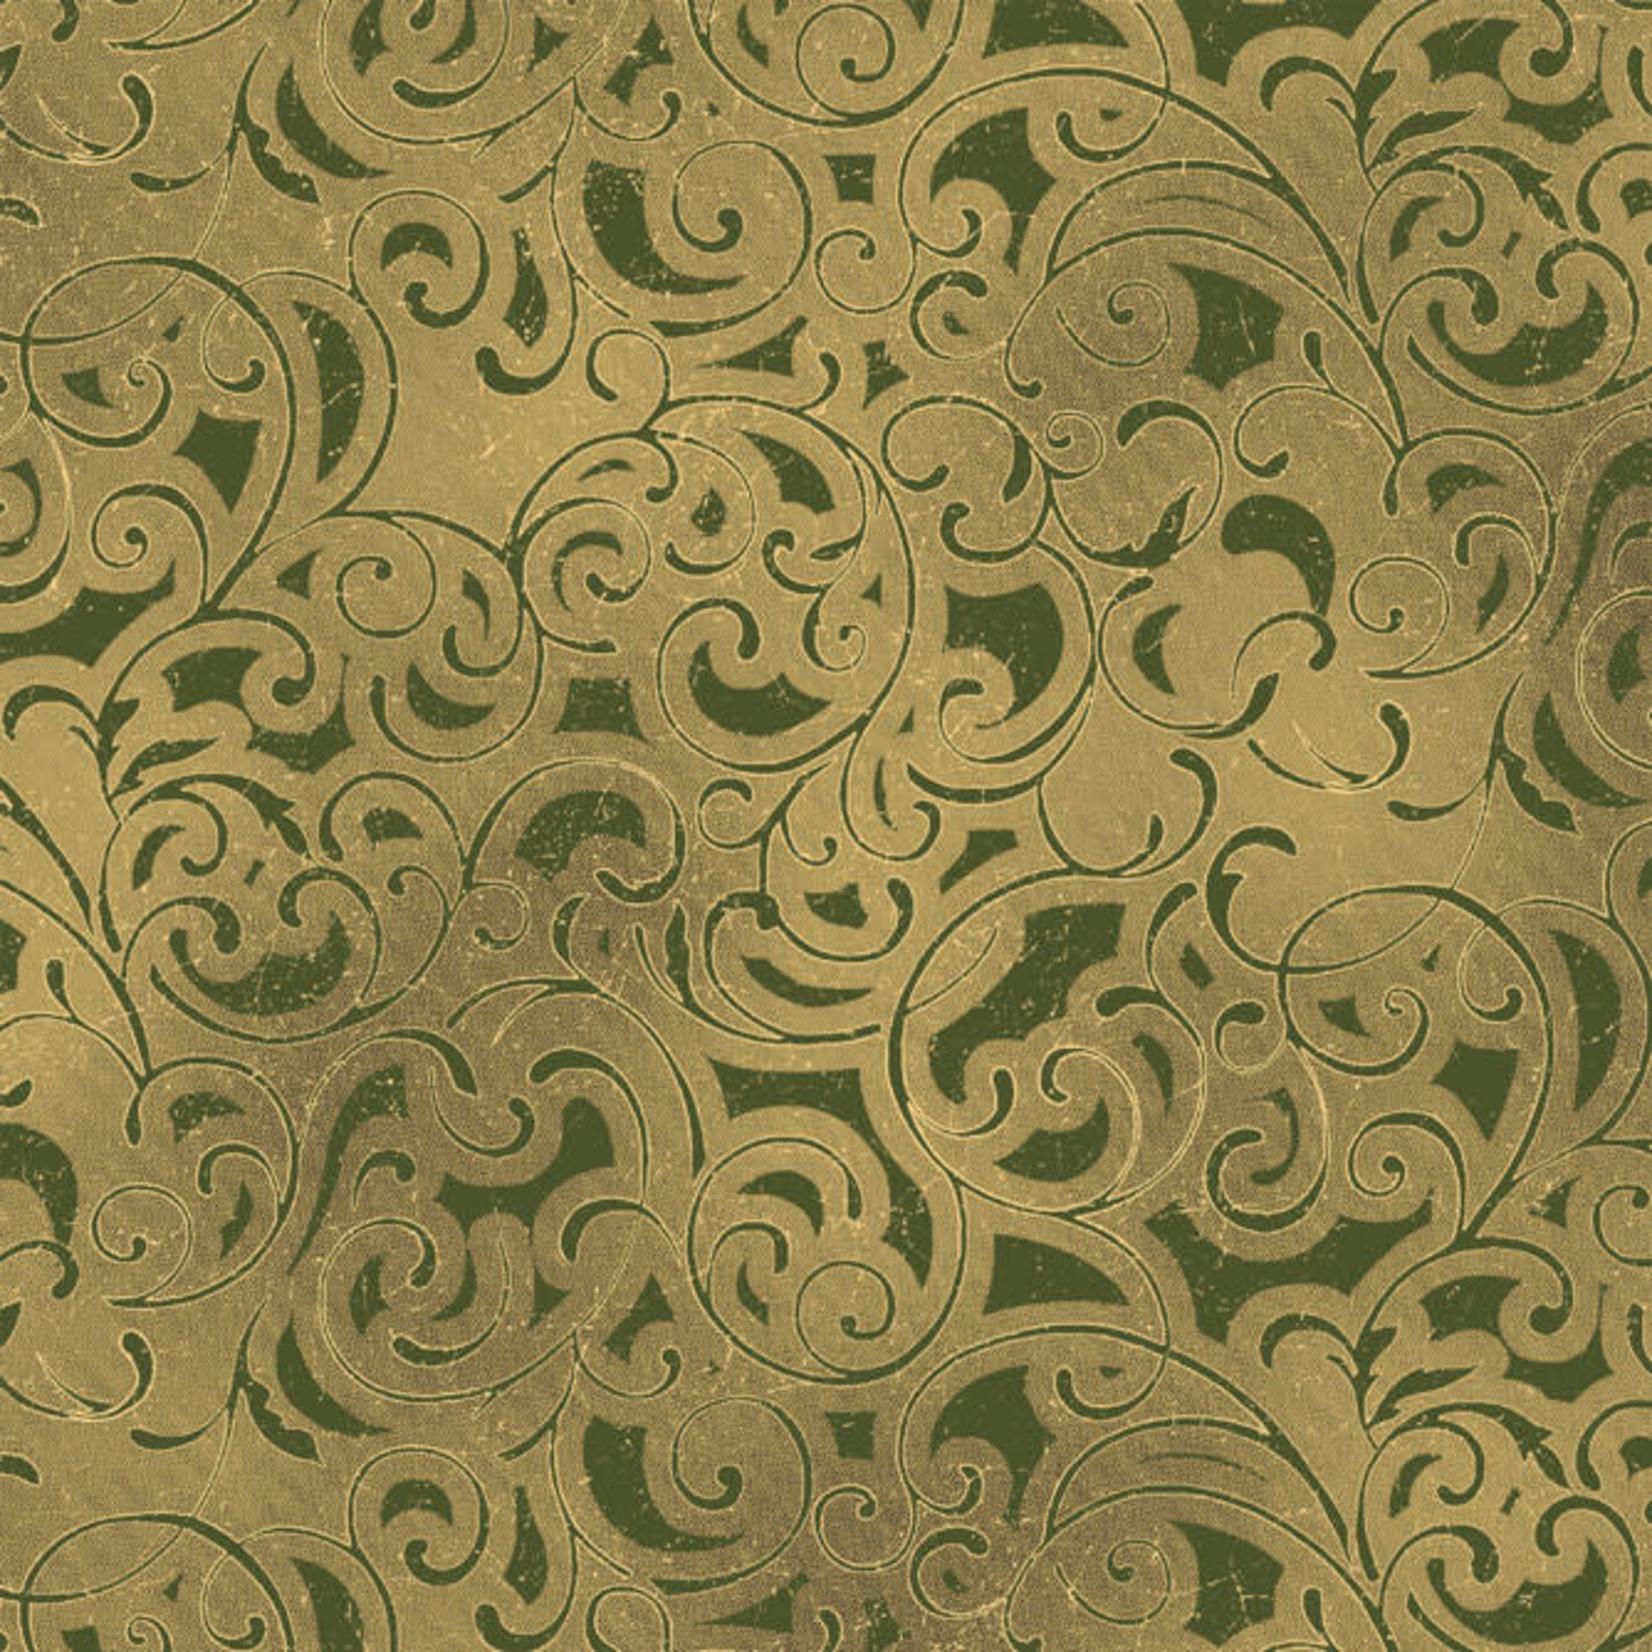 Windham Fabrics Grand Illusion - Scroll - Green